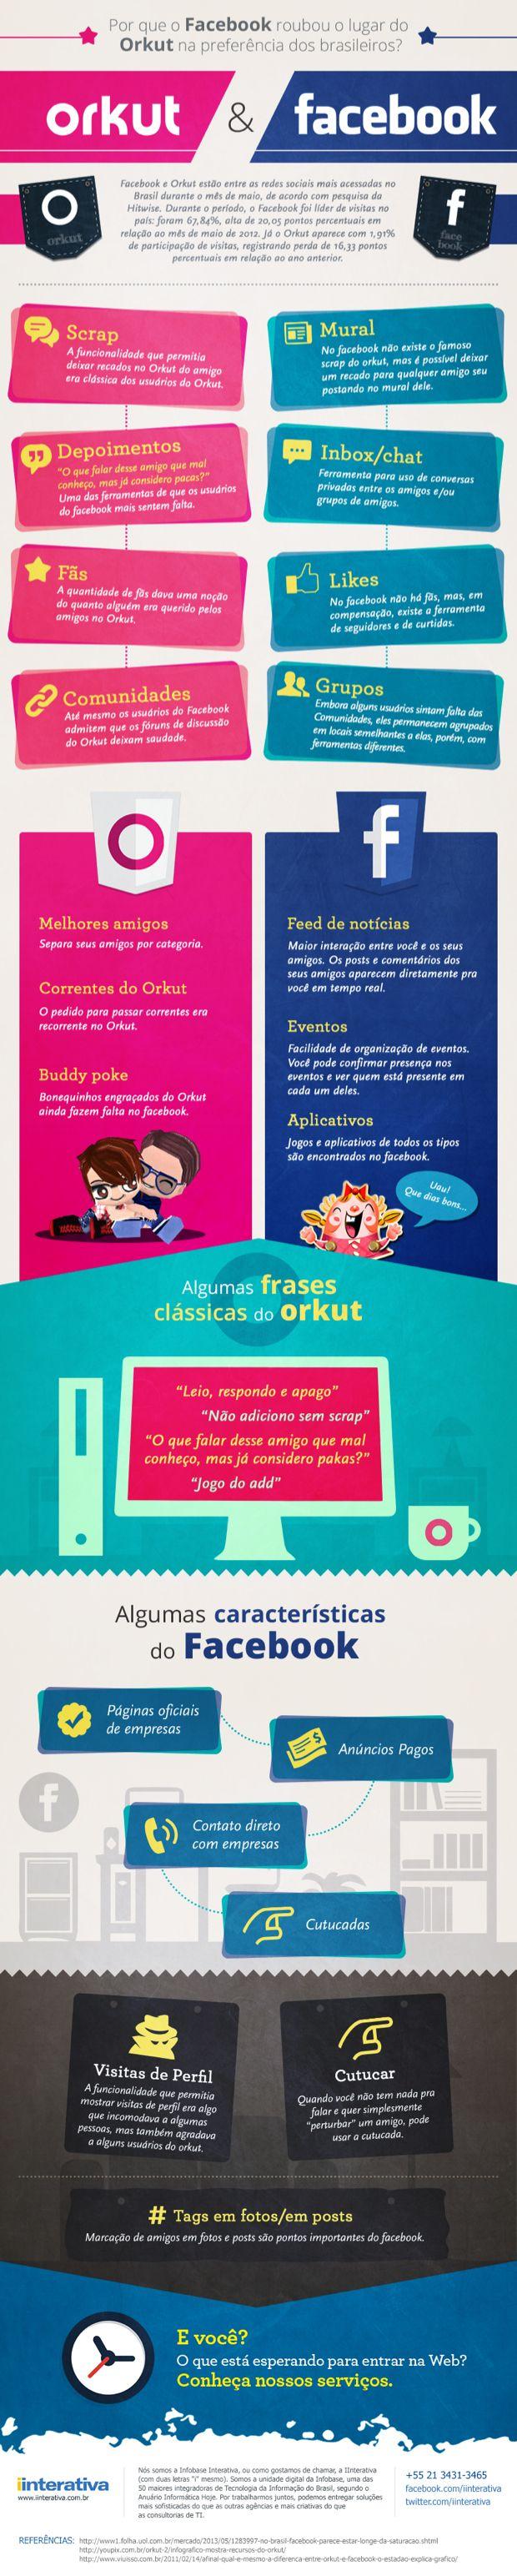 Orkut x Facebook: ainda existe essa guerra ?  Descubra porque o Facebook roubou o lugar do Orkut na preferência dos brasileiro. Acesse: http://ow.ly/qiOED